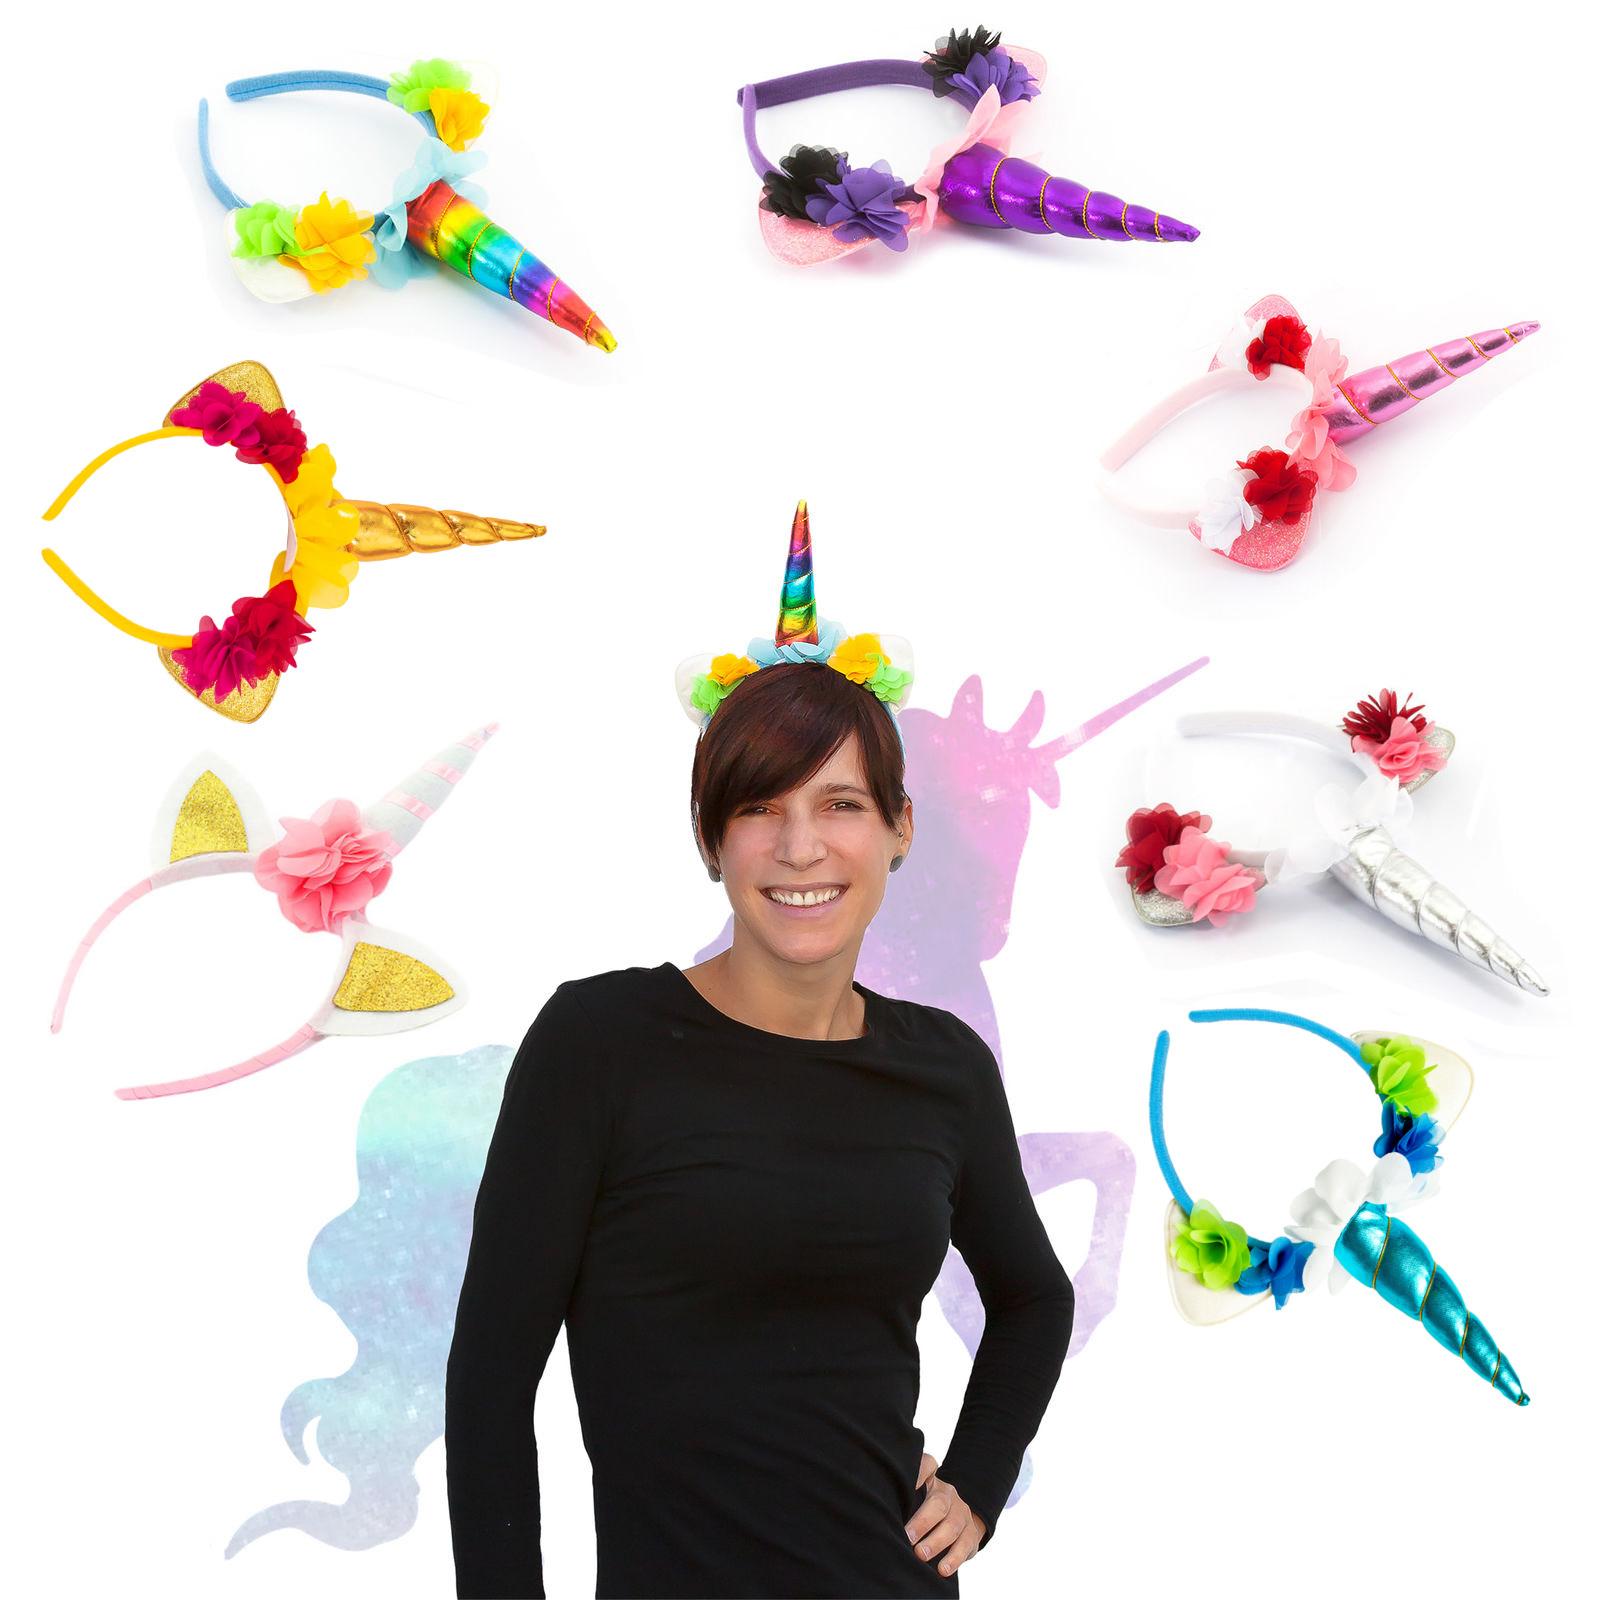 Einhorn Haarreifen Unicorn Haarreif Fasching Karneval Jga Rosa Oder